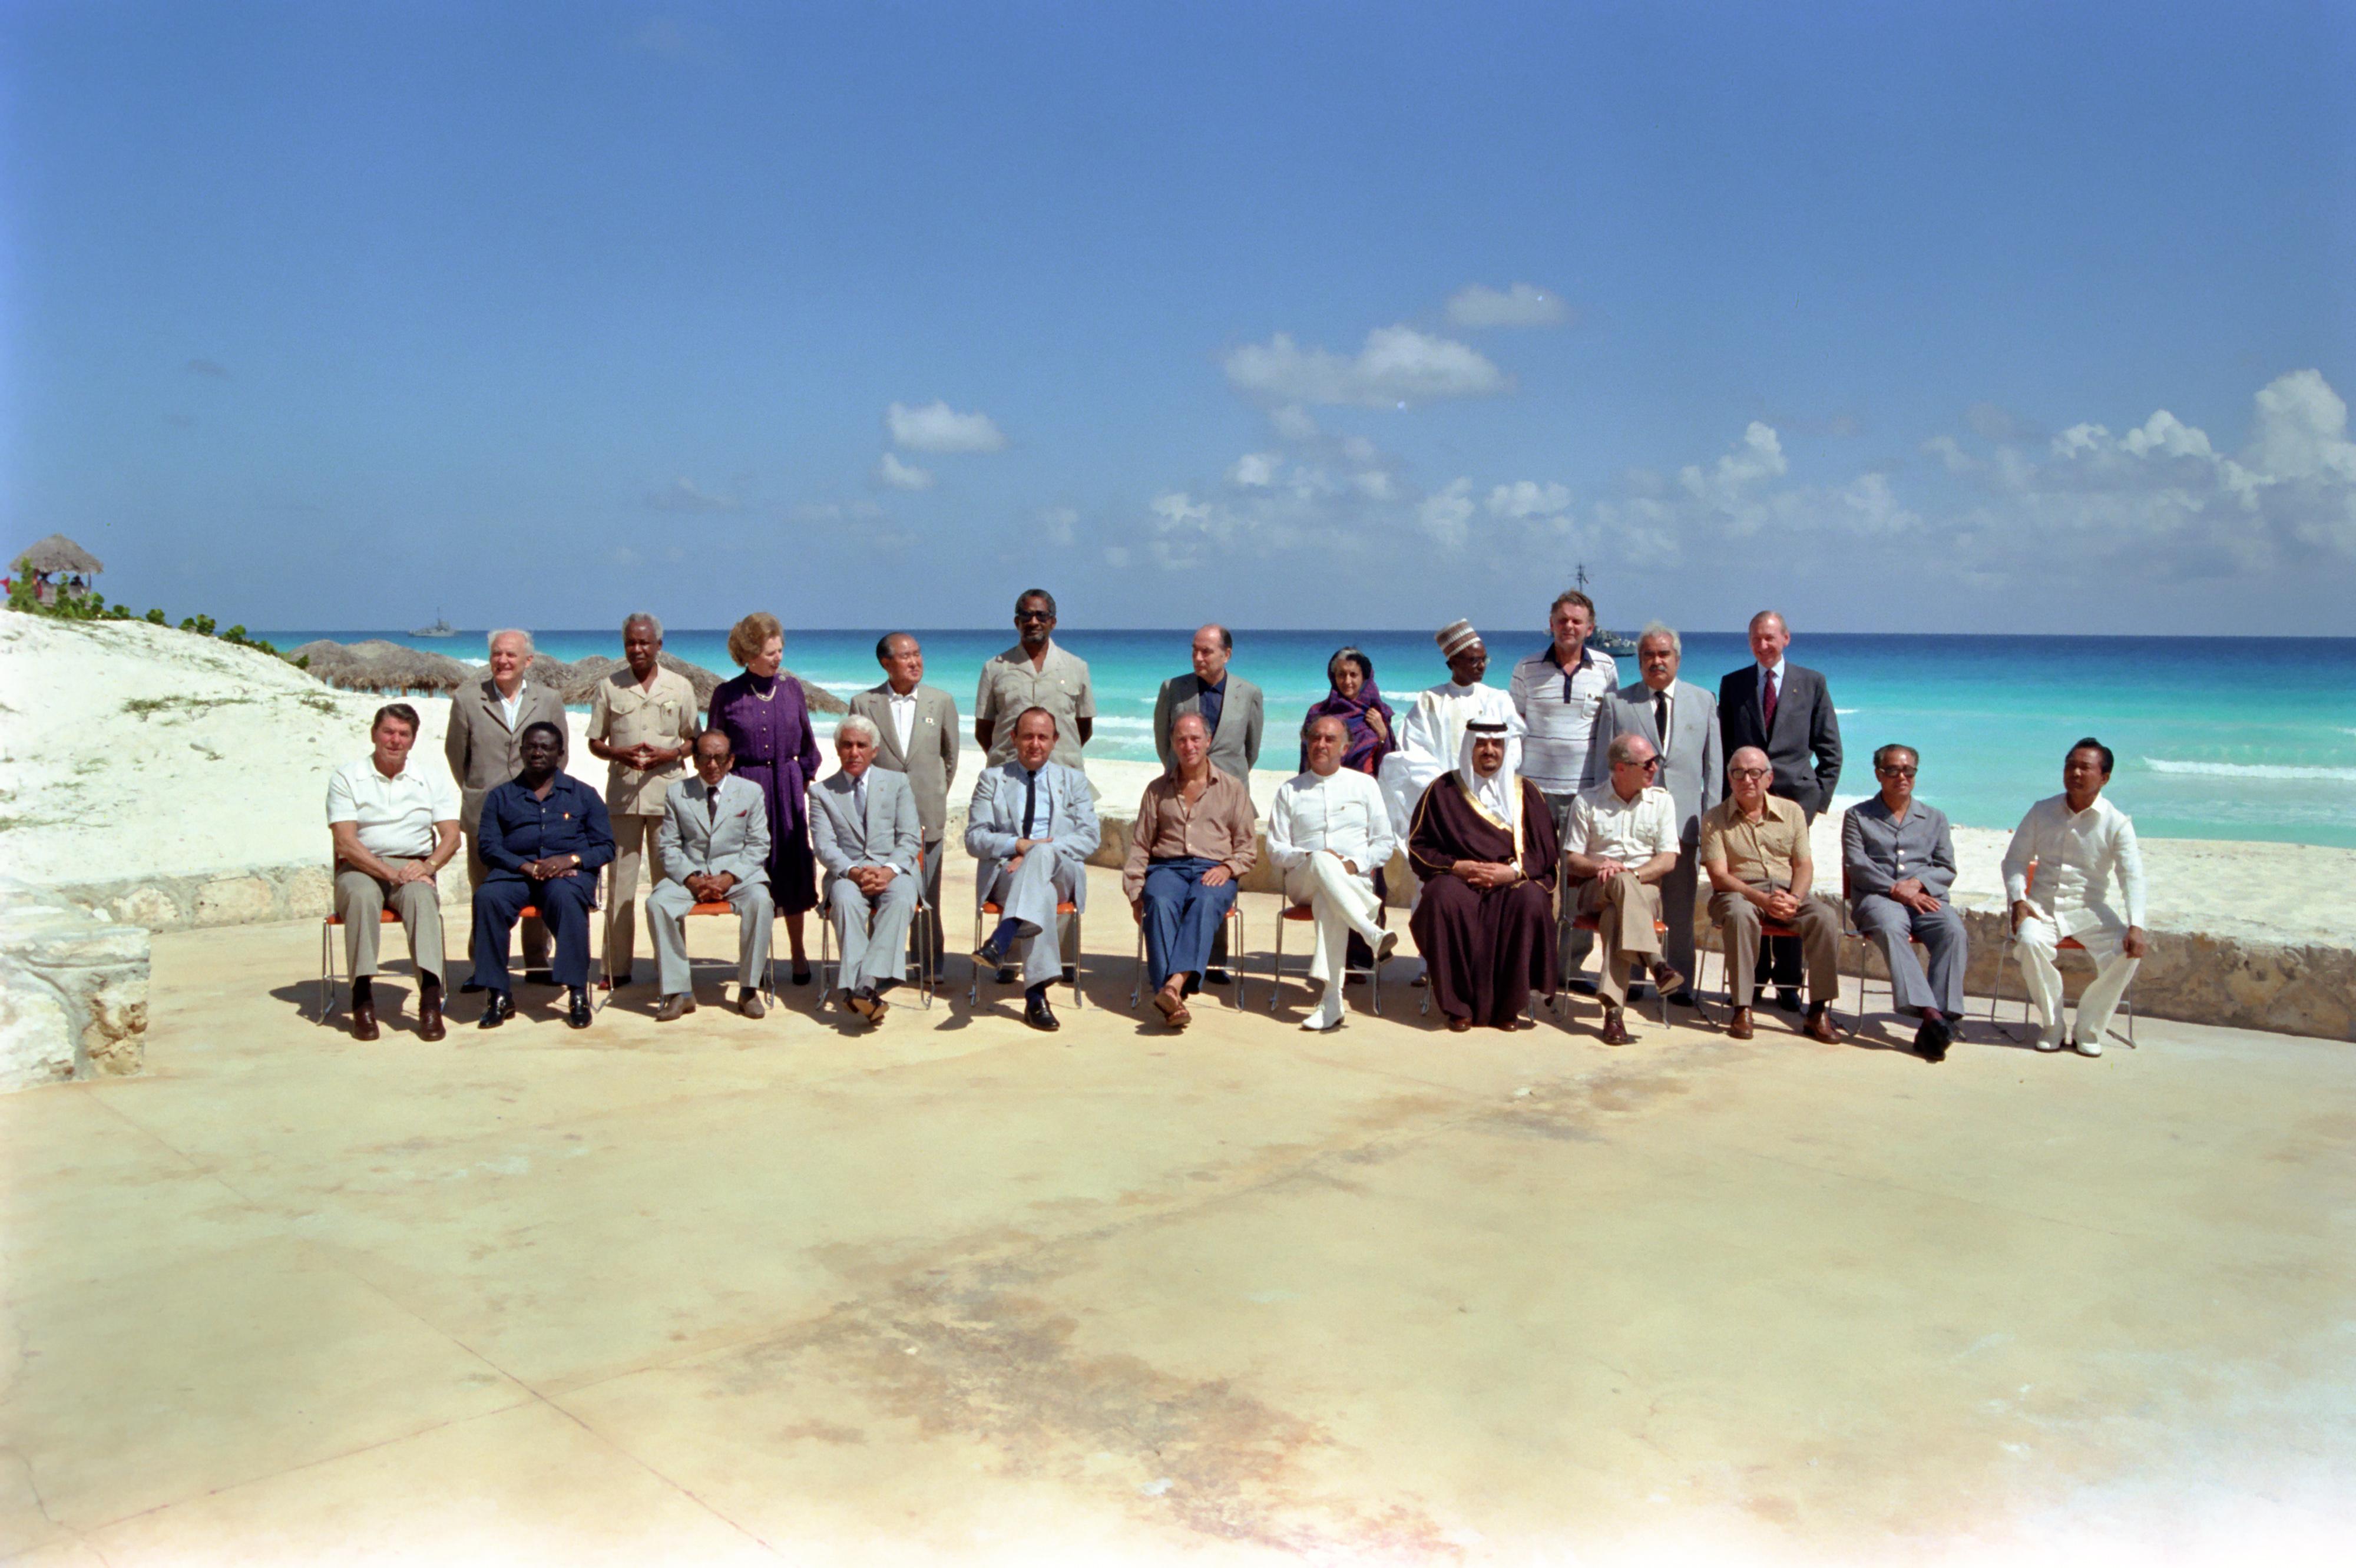 Heads of State Cancun Summit 1981.jpg